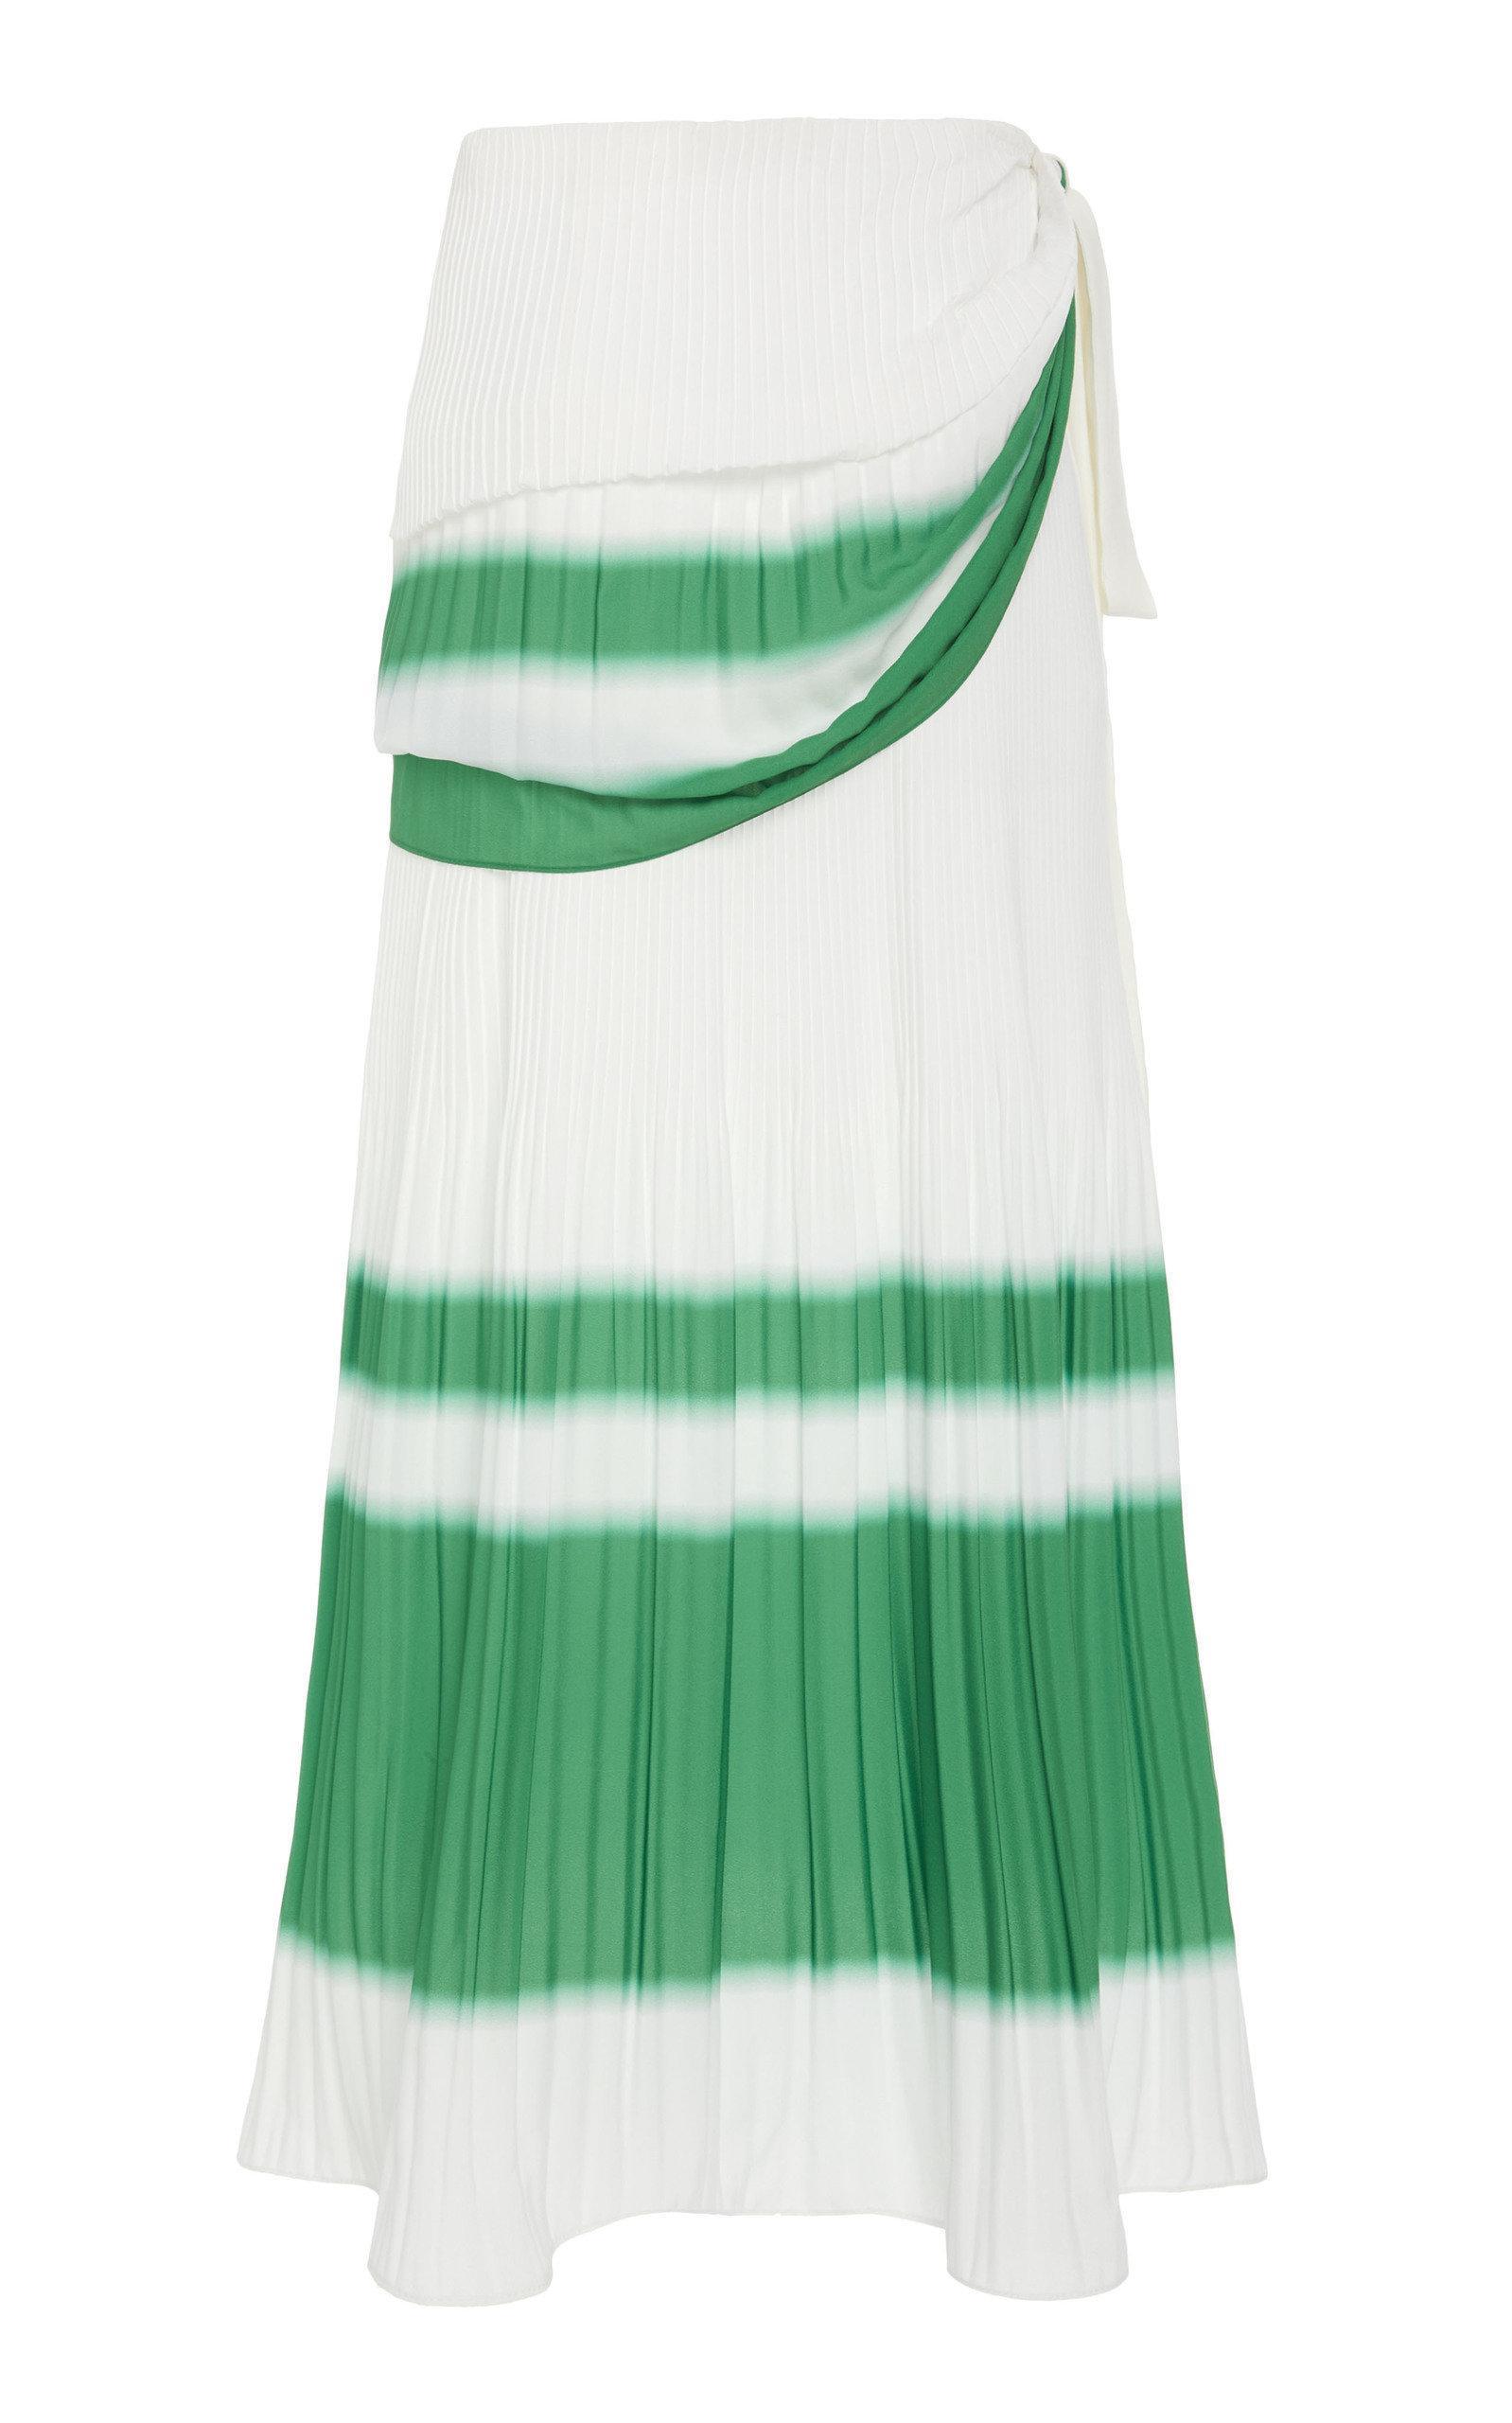 066912d6a1 Prabal Gurung Hary Draped Wrap Skirt in White - Lyst